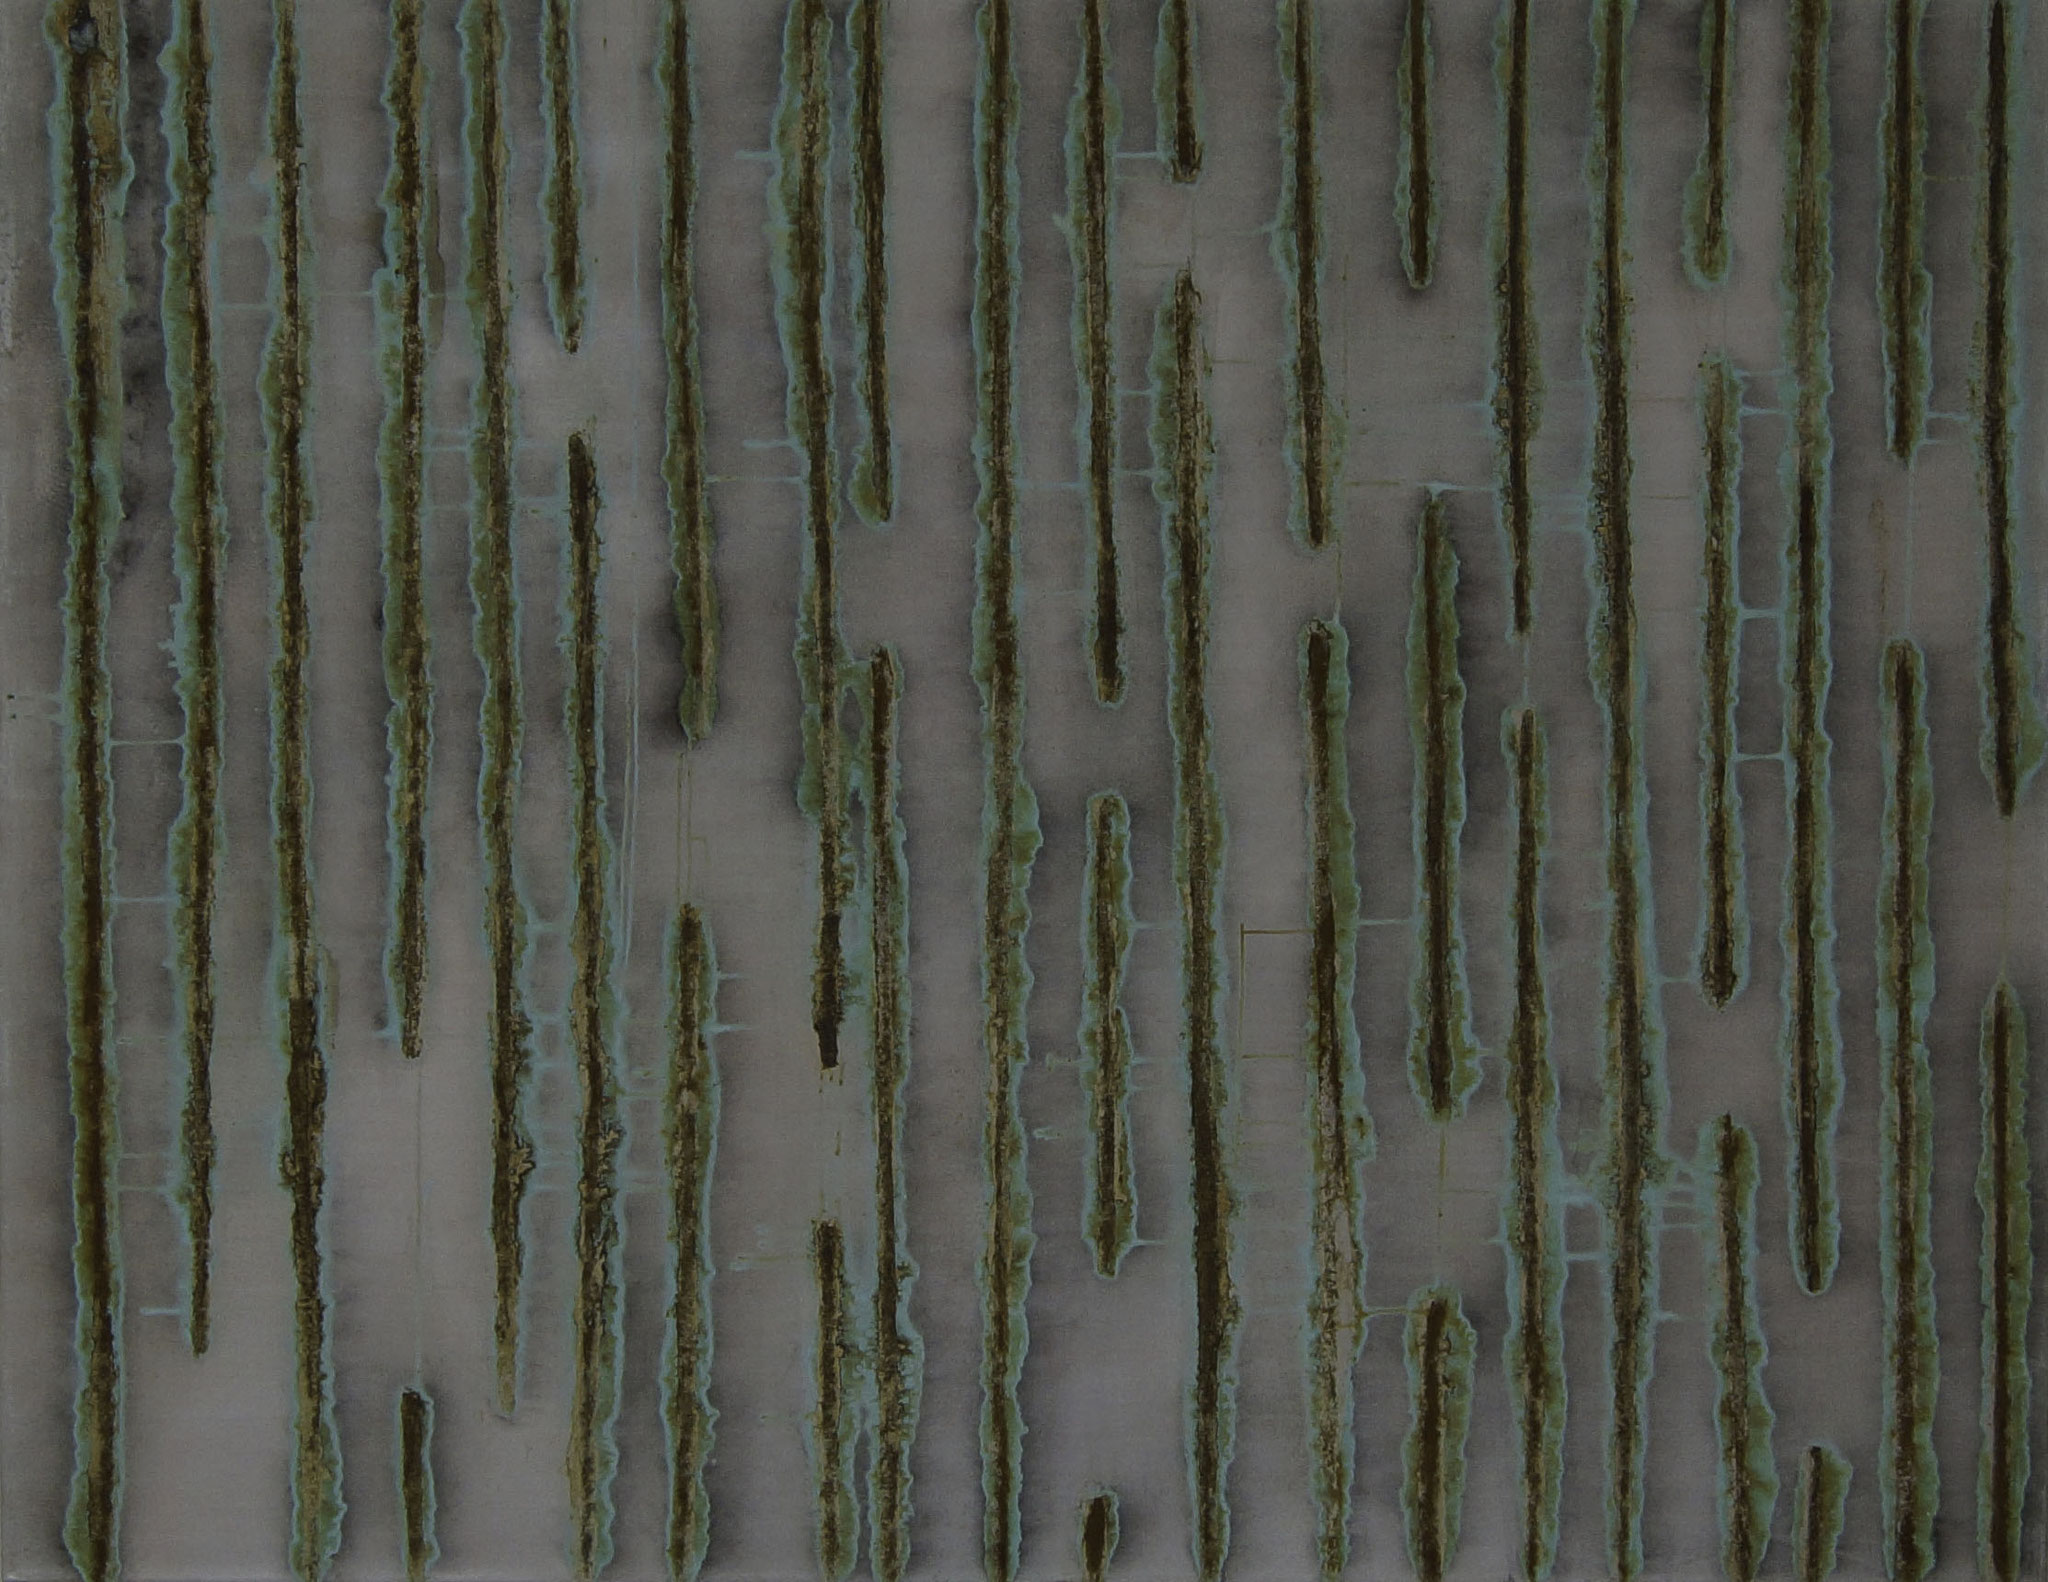 Sequenz 1 ( 140cm x 180cm )